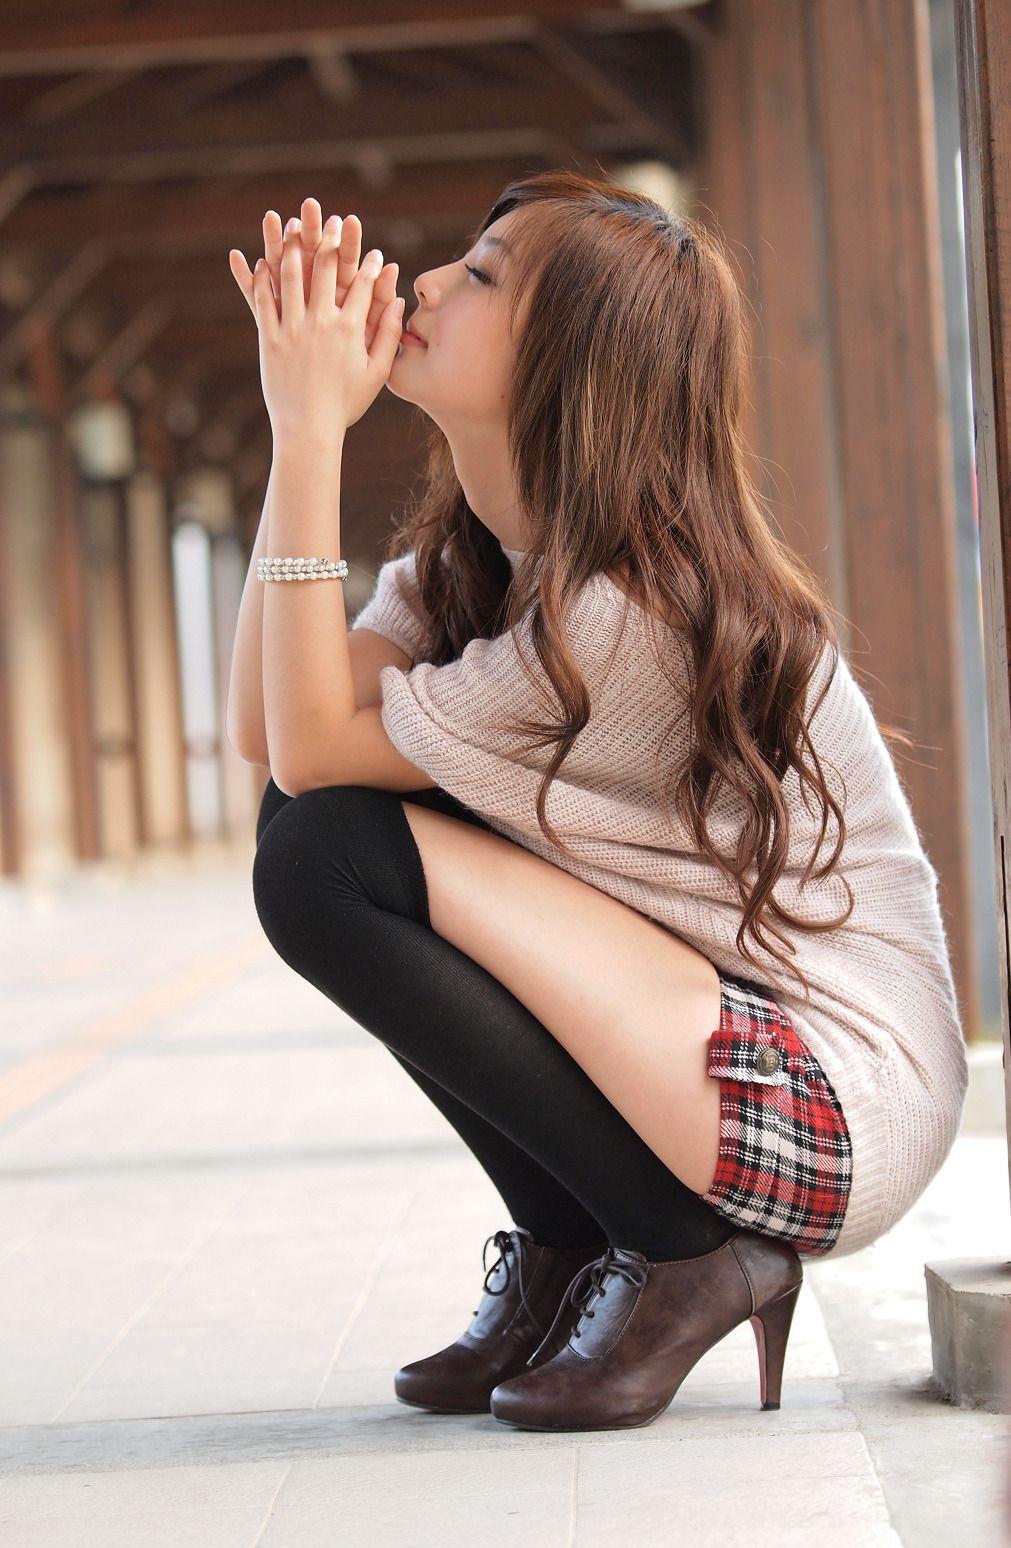 girls socks Asian wearing knee-high